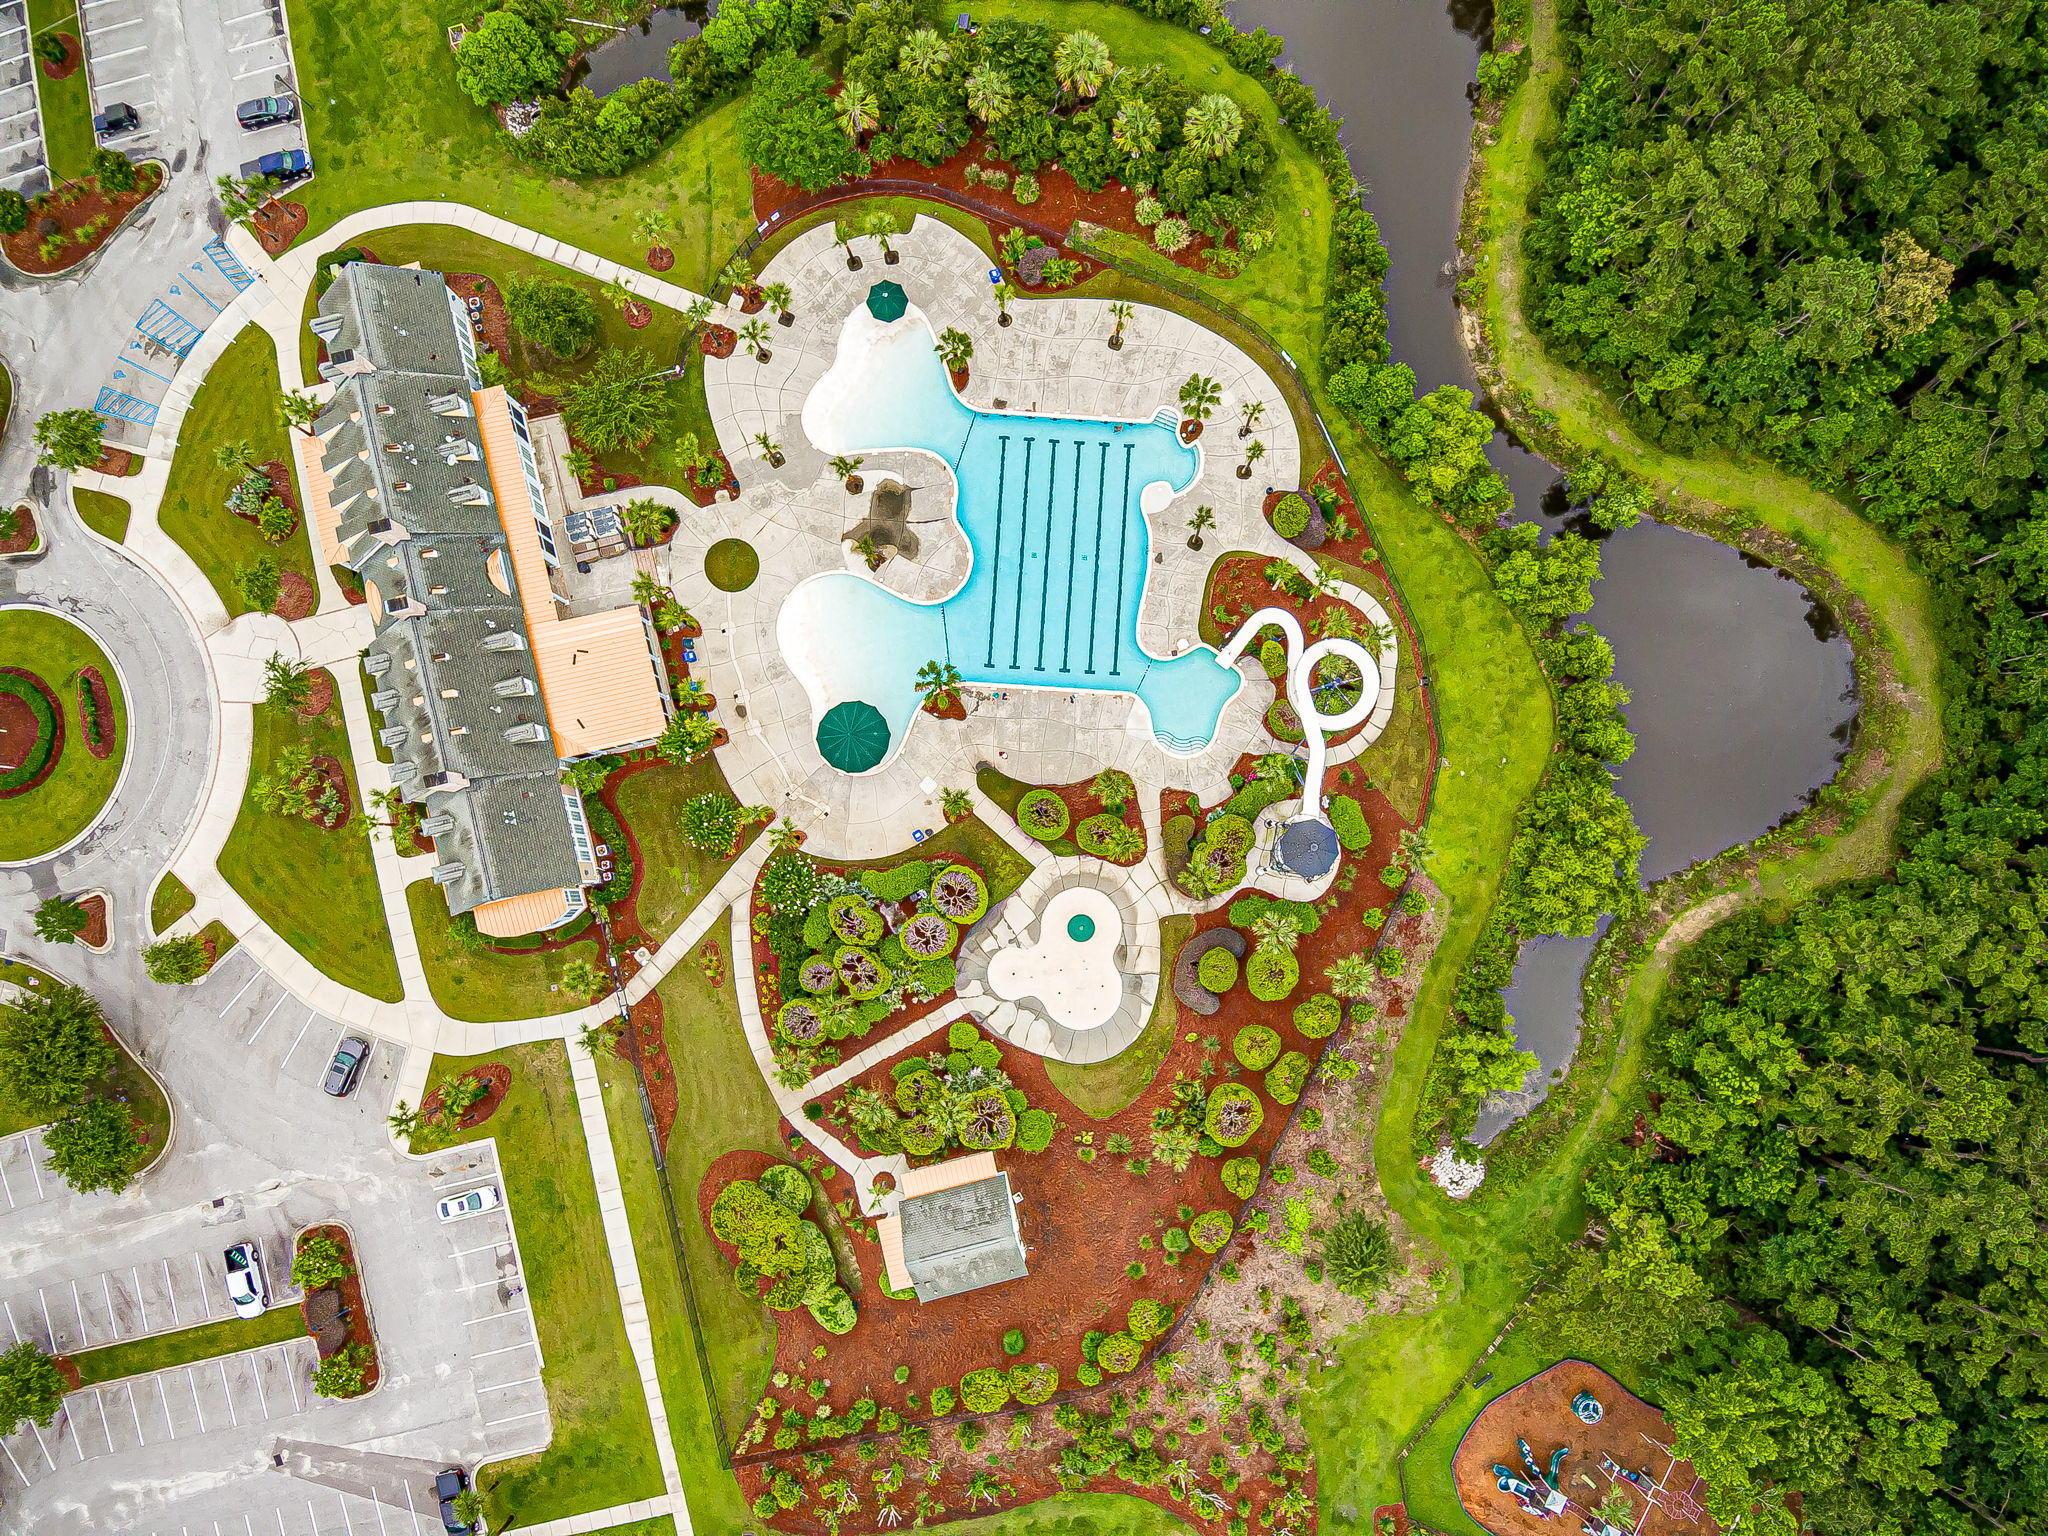 Dunes West Homes For Sale - 2476 Kings Gate, Mount Pleasant, SC - 11